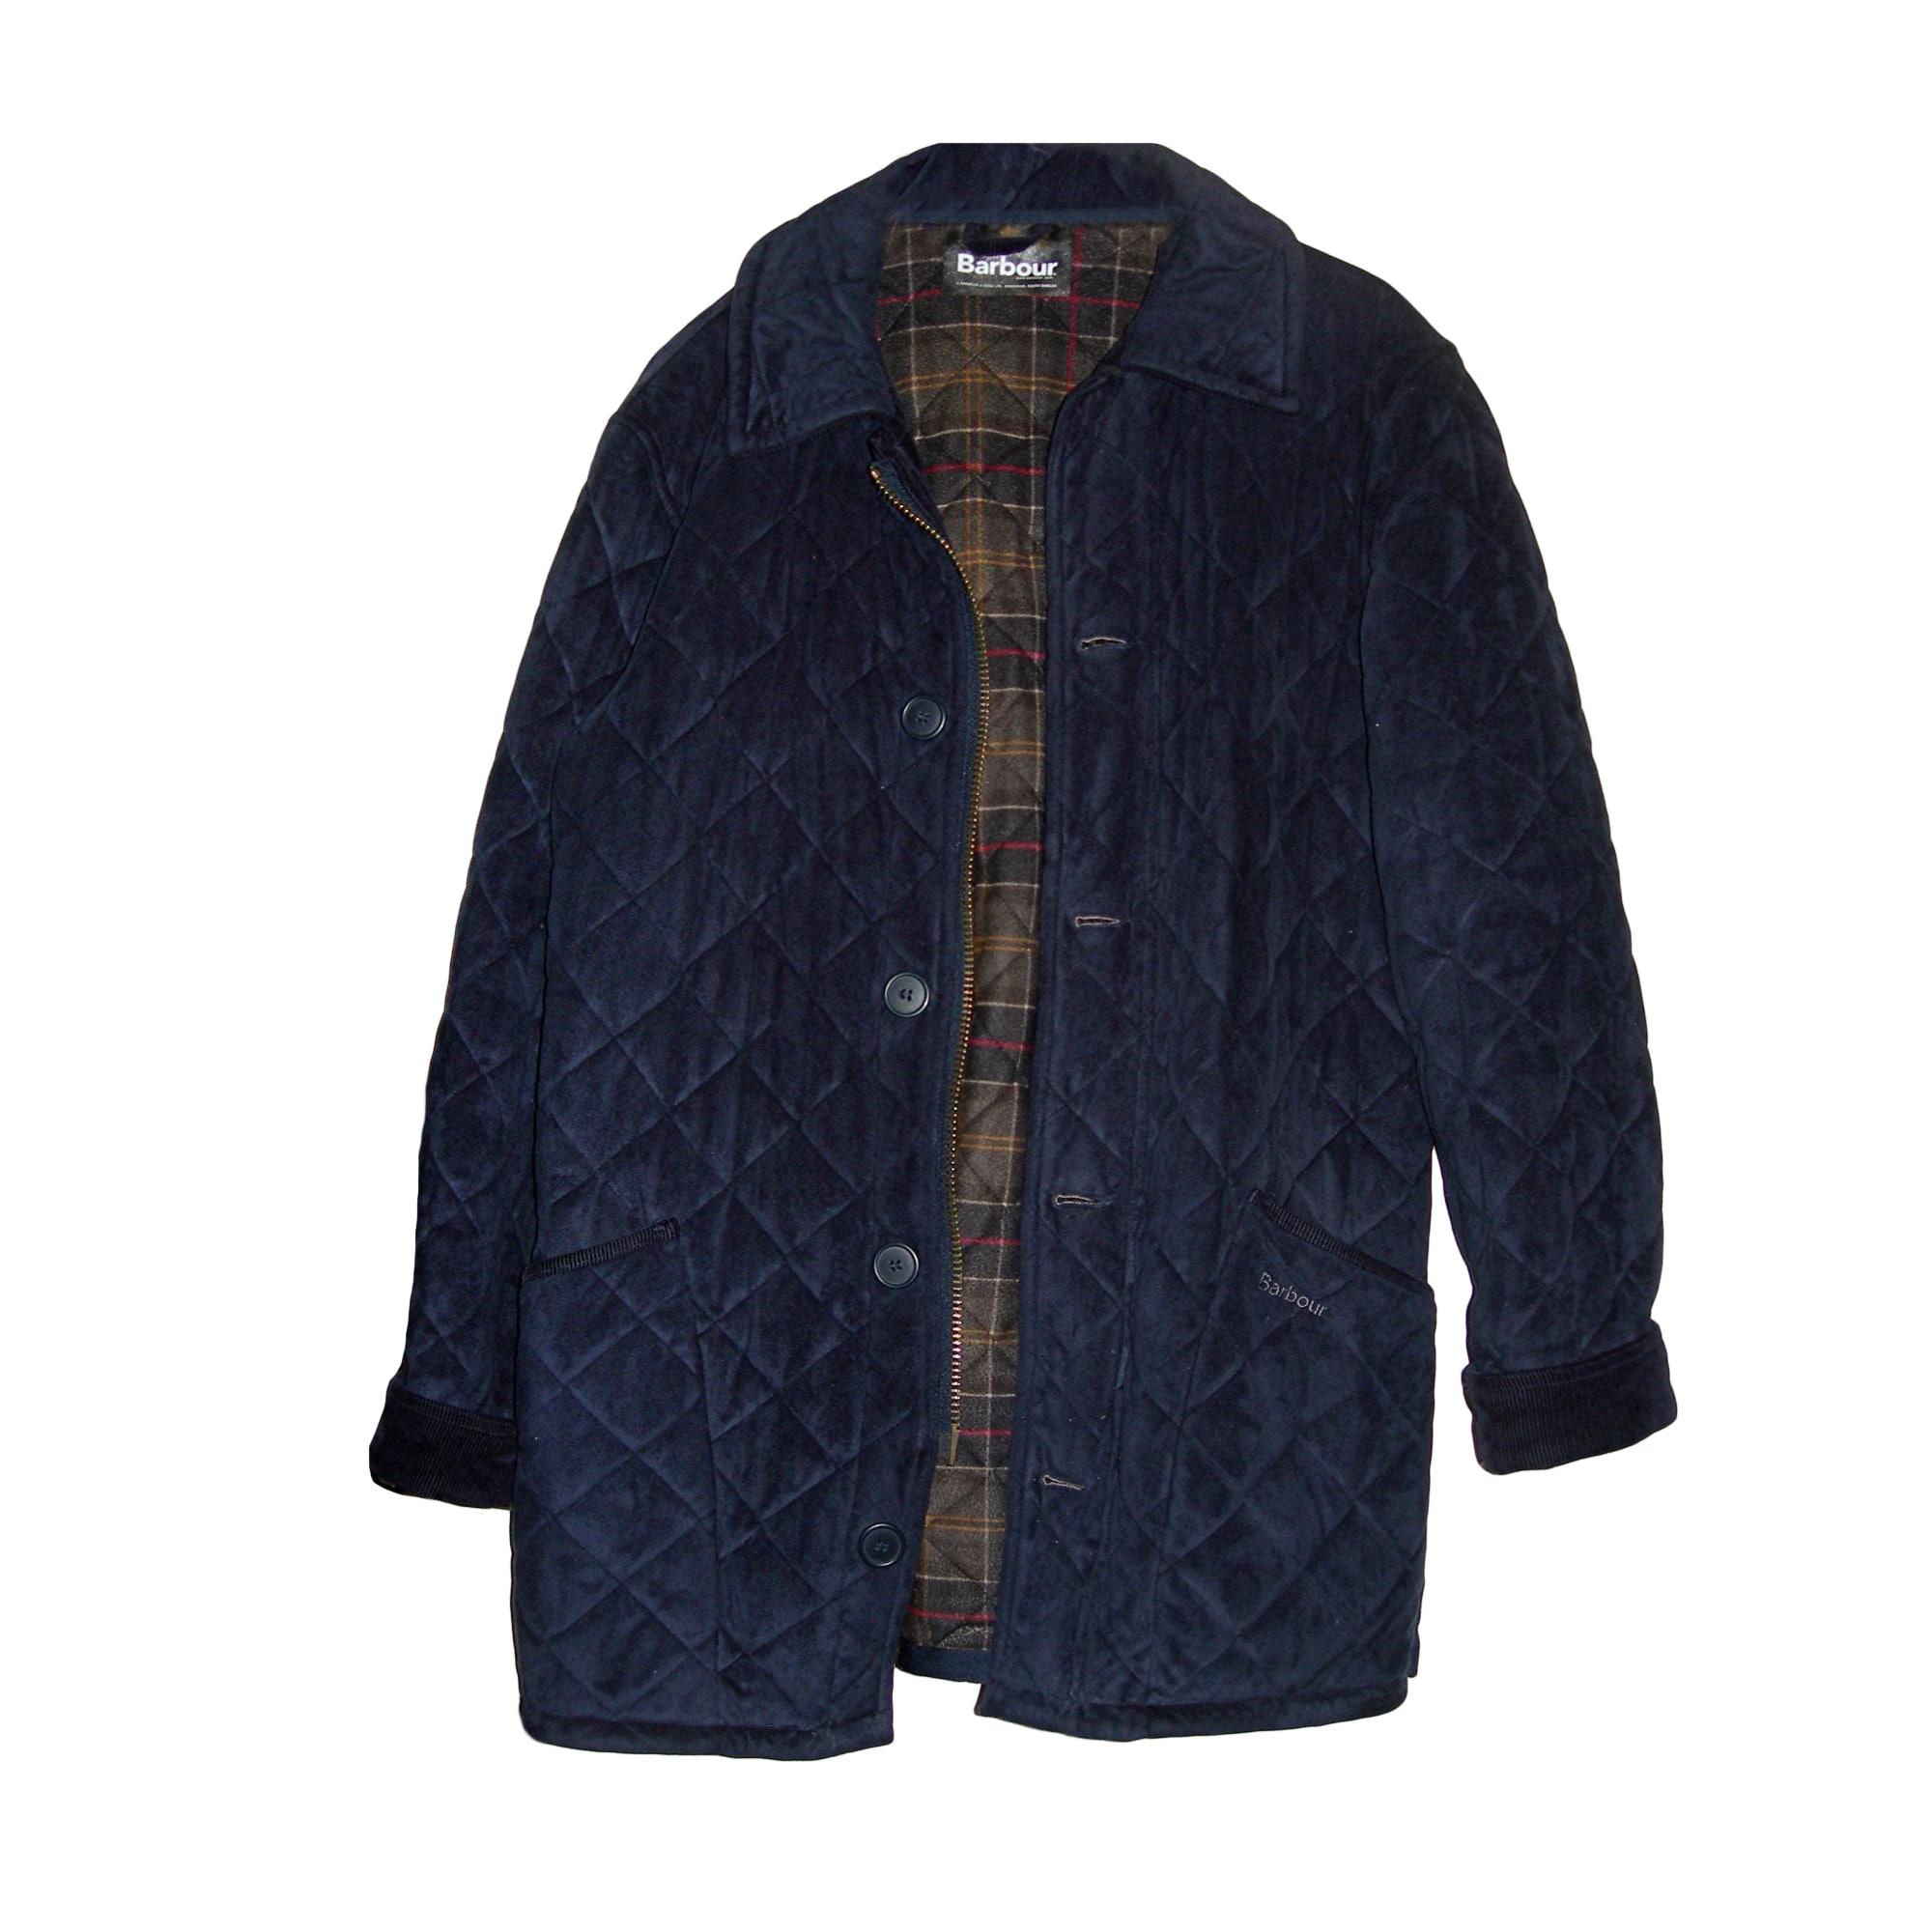 Manteau femme 3xl